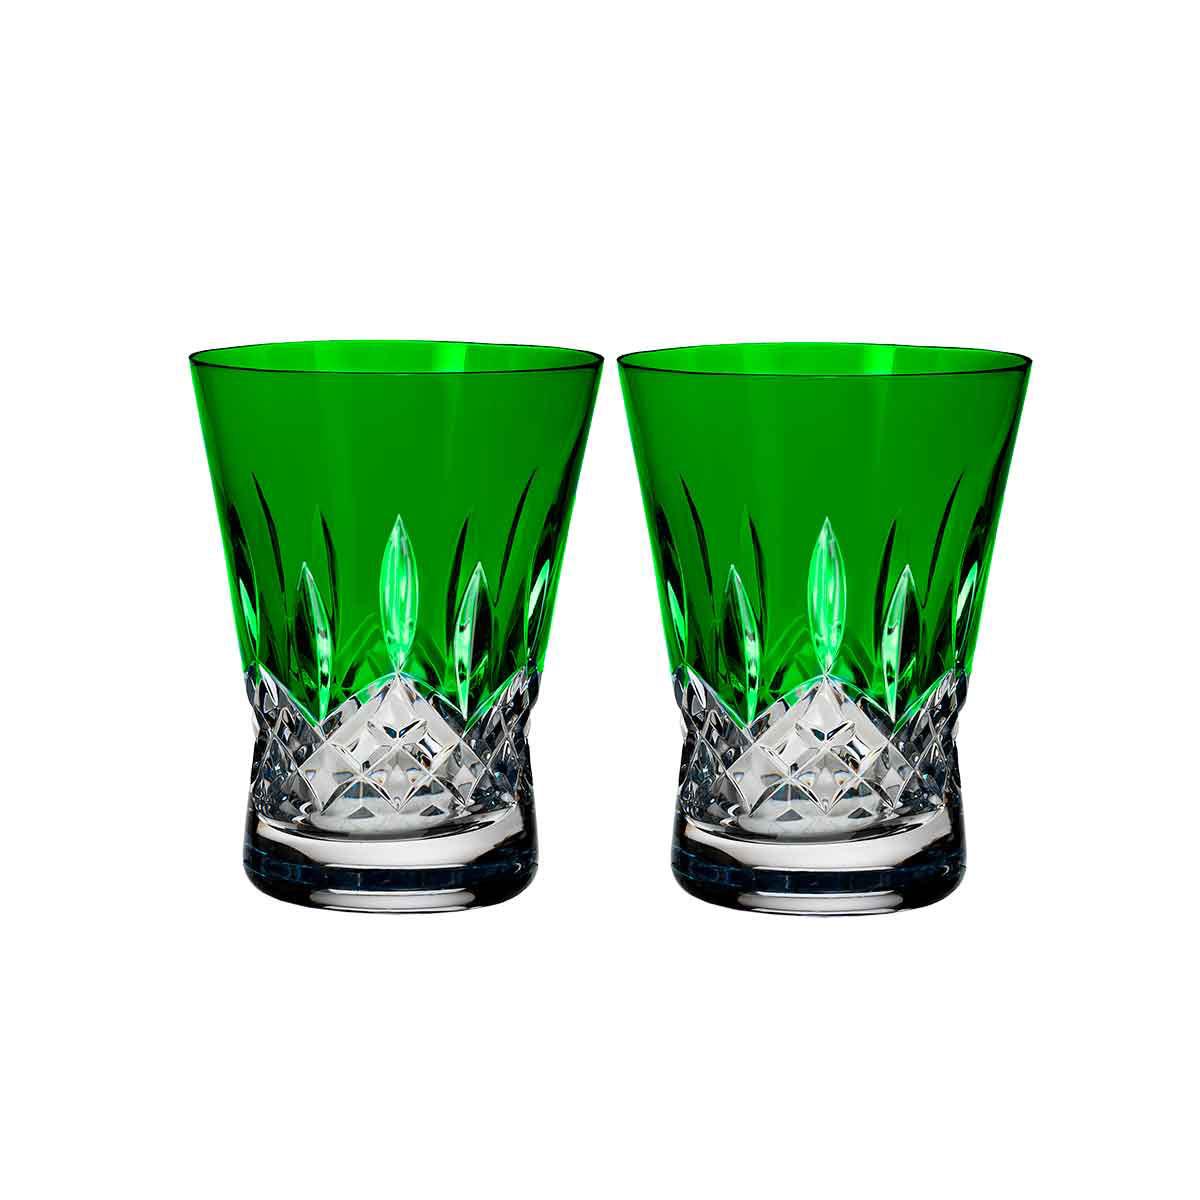 Waterford Crystal, Lismore Pops Emerald Crystal DOF Tumbler, Pair